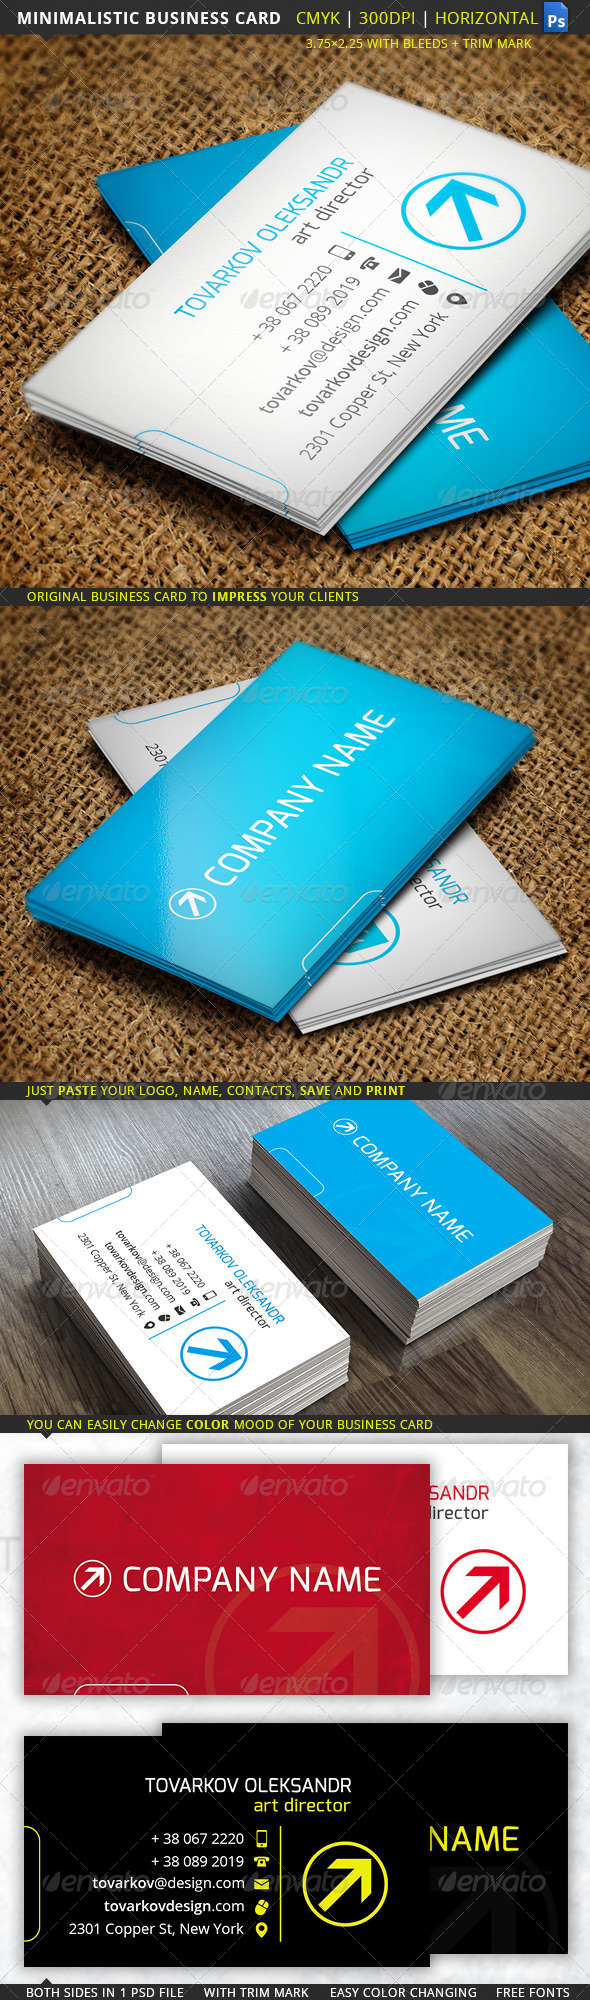 GraphicRiver Minimalistic Business Card 5631230